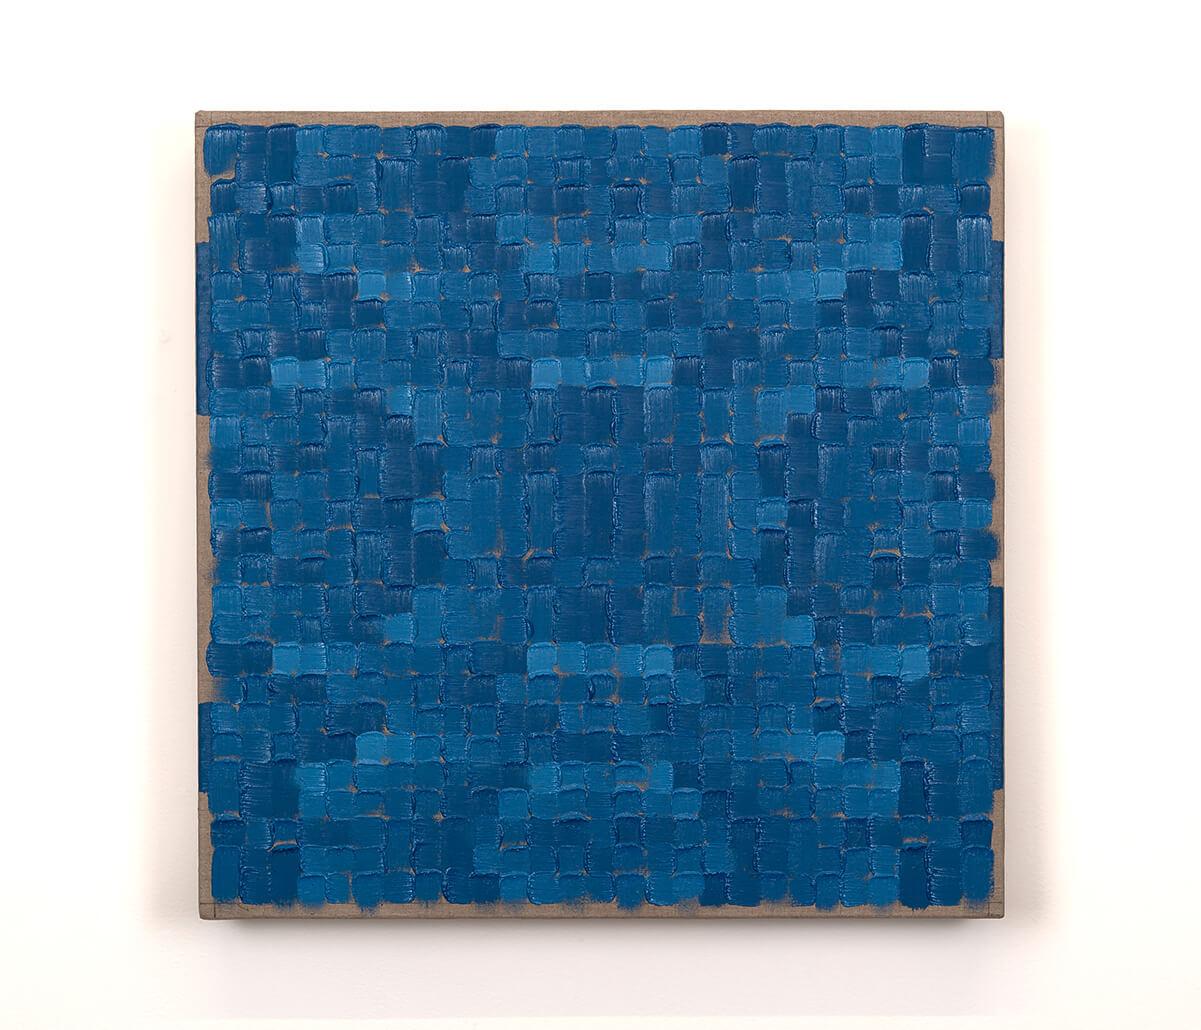 Randy Gibson : Quadrilateral Grid 3 (Cobalt Chromite Blue-Green Spinel)